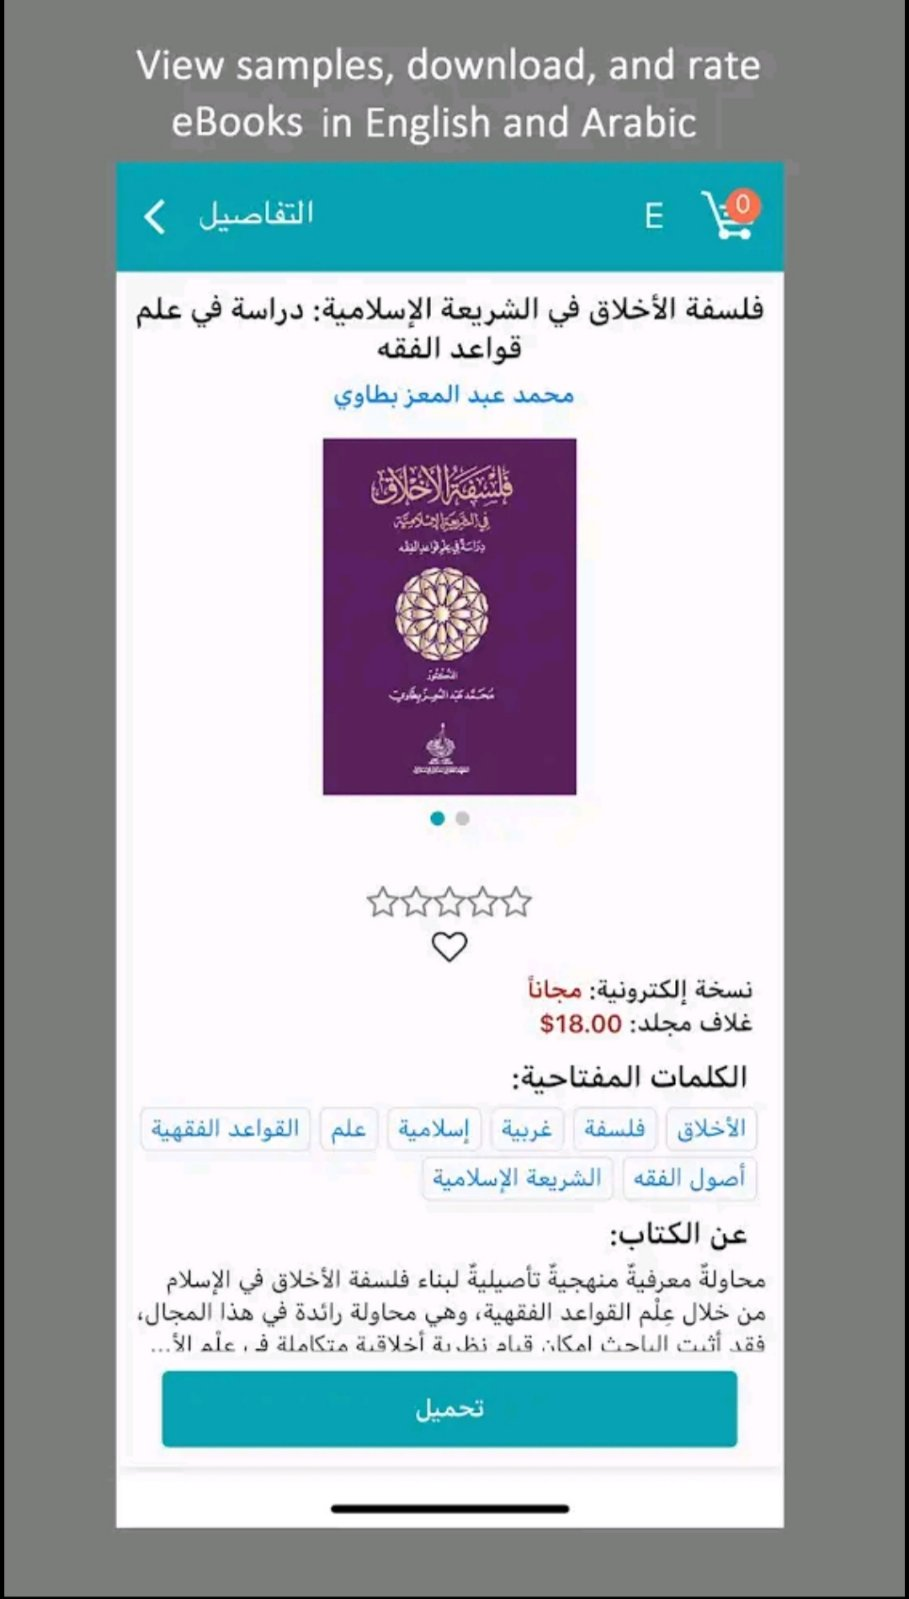 IIIT Books - Bilingual eBook Commerce Mobile App 7